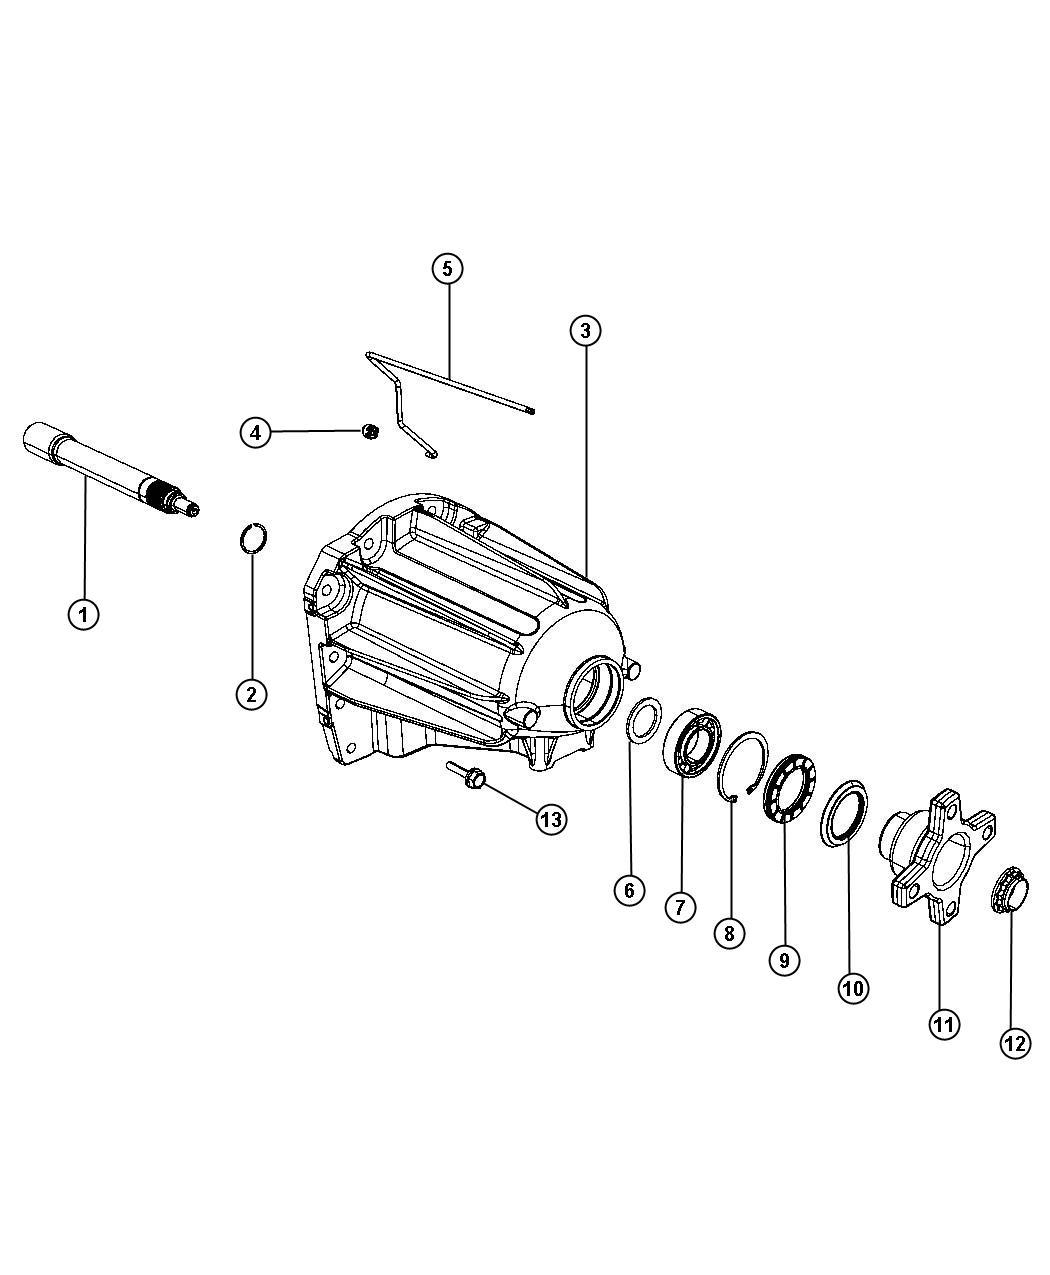 Dodge Nitro Bearing Output Shaft Extension